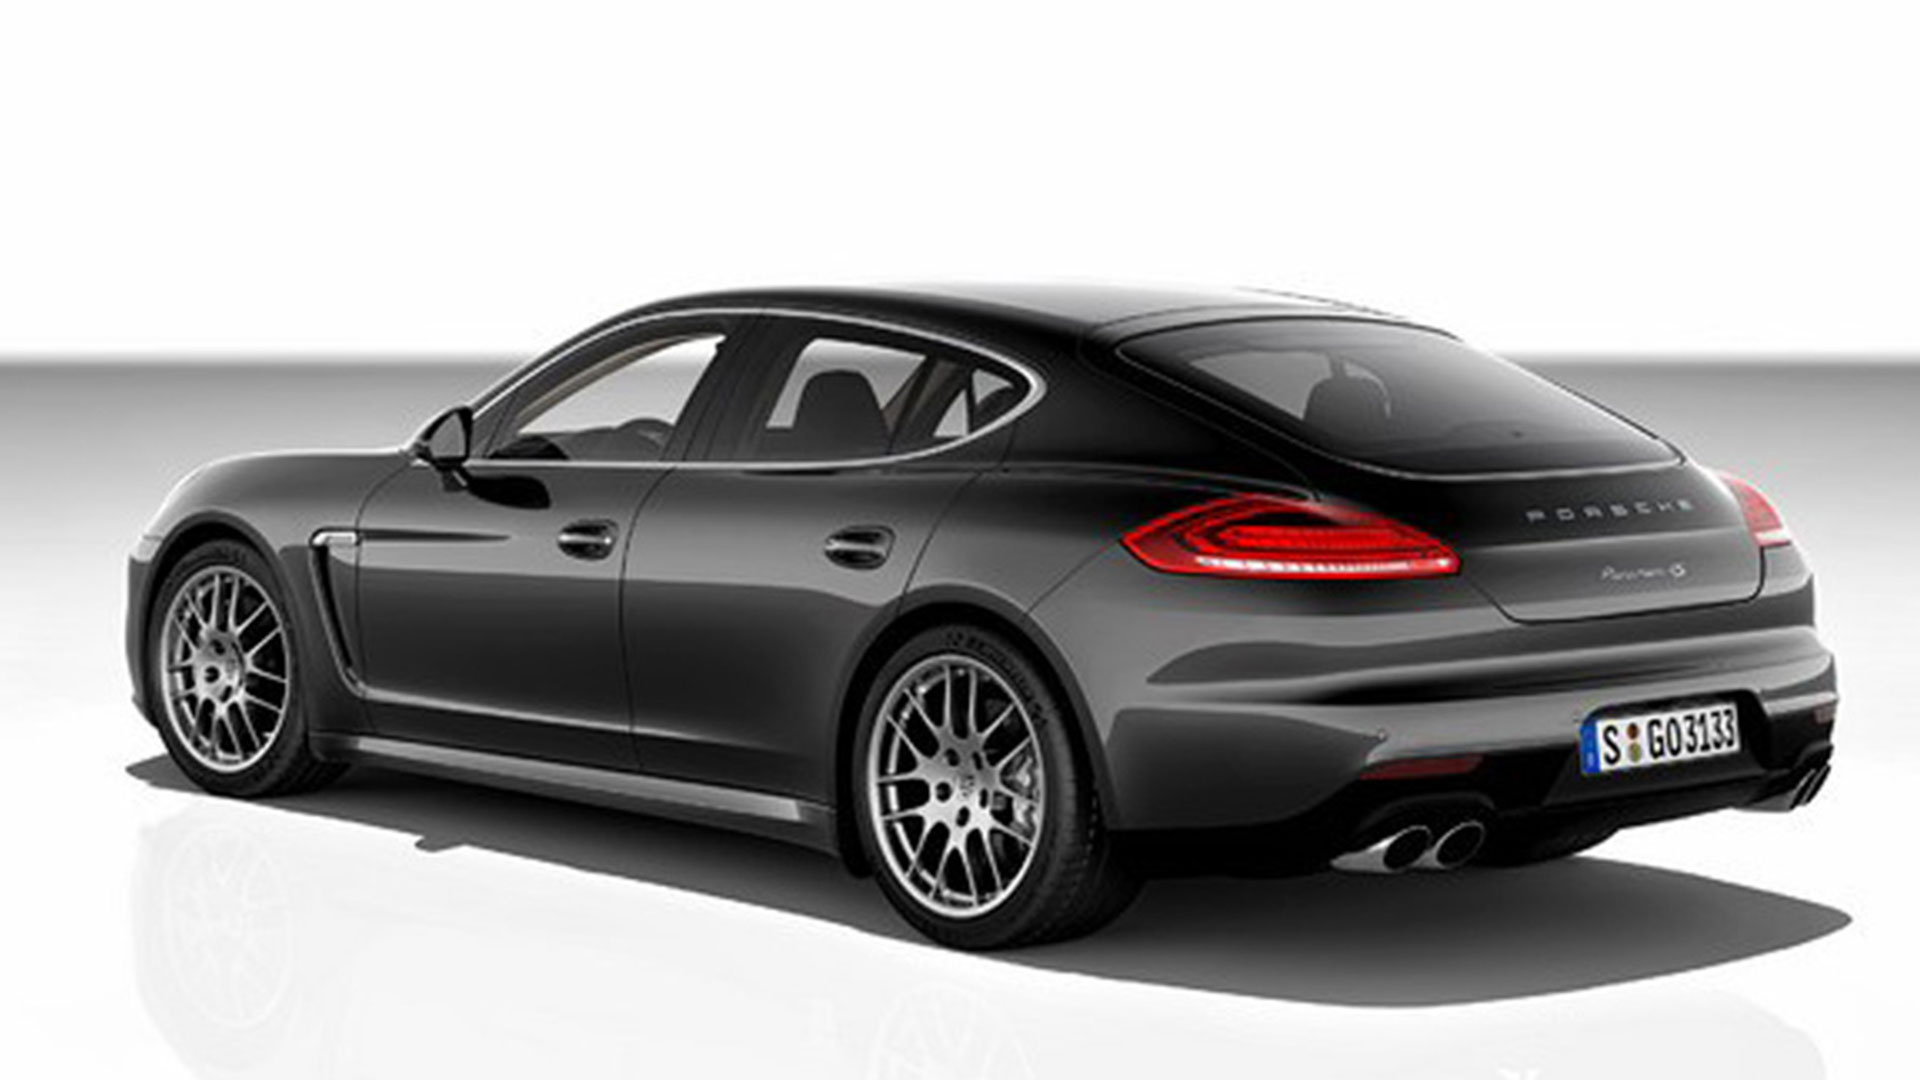 Price Of Porsche Panamera 4 Car Background